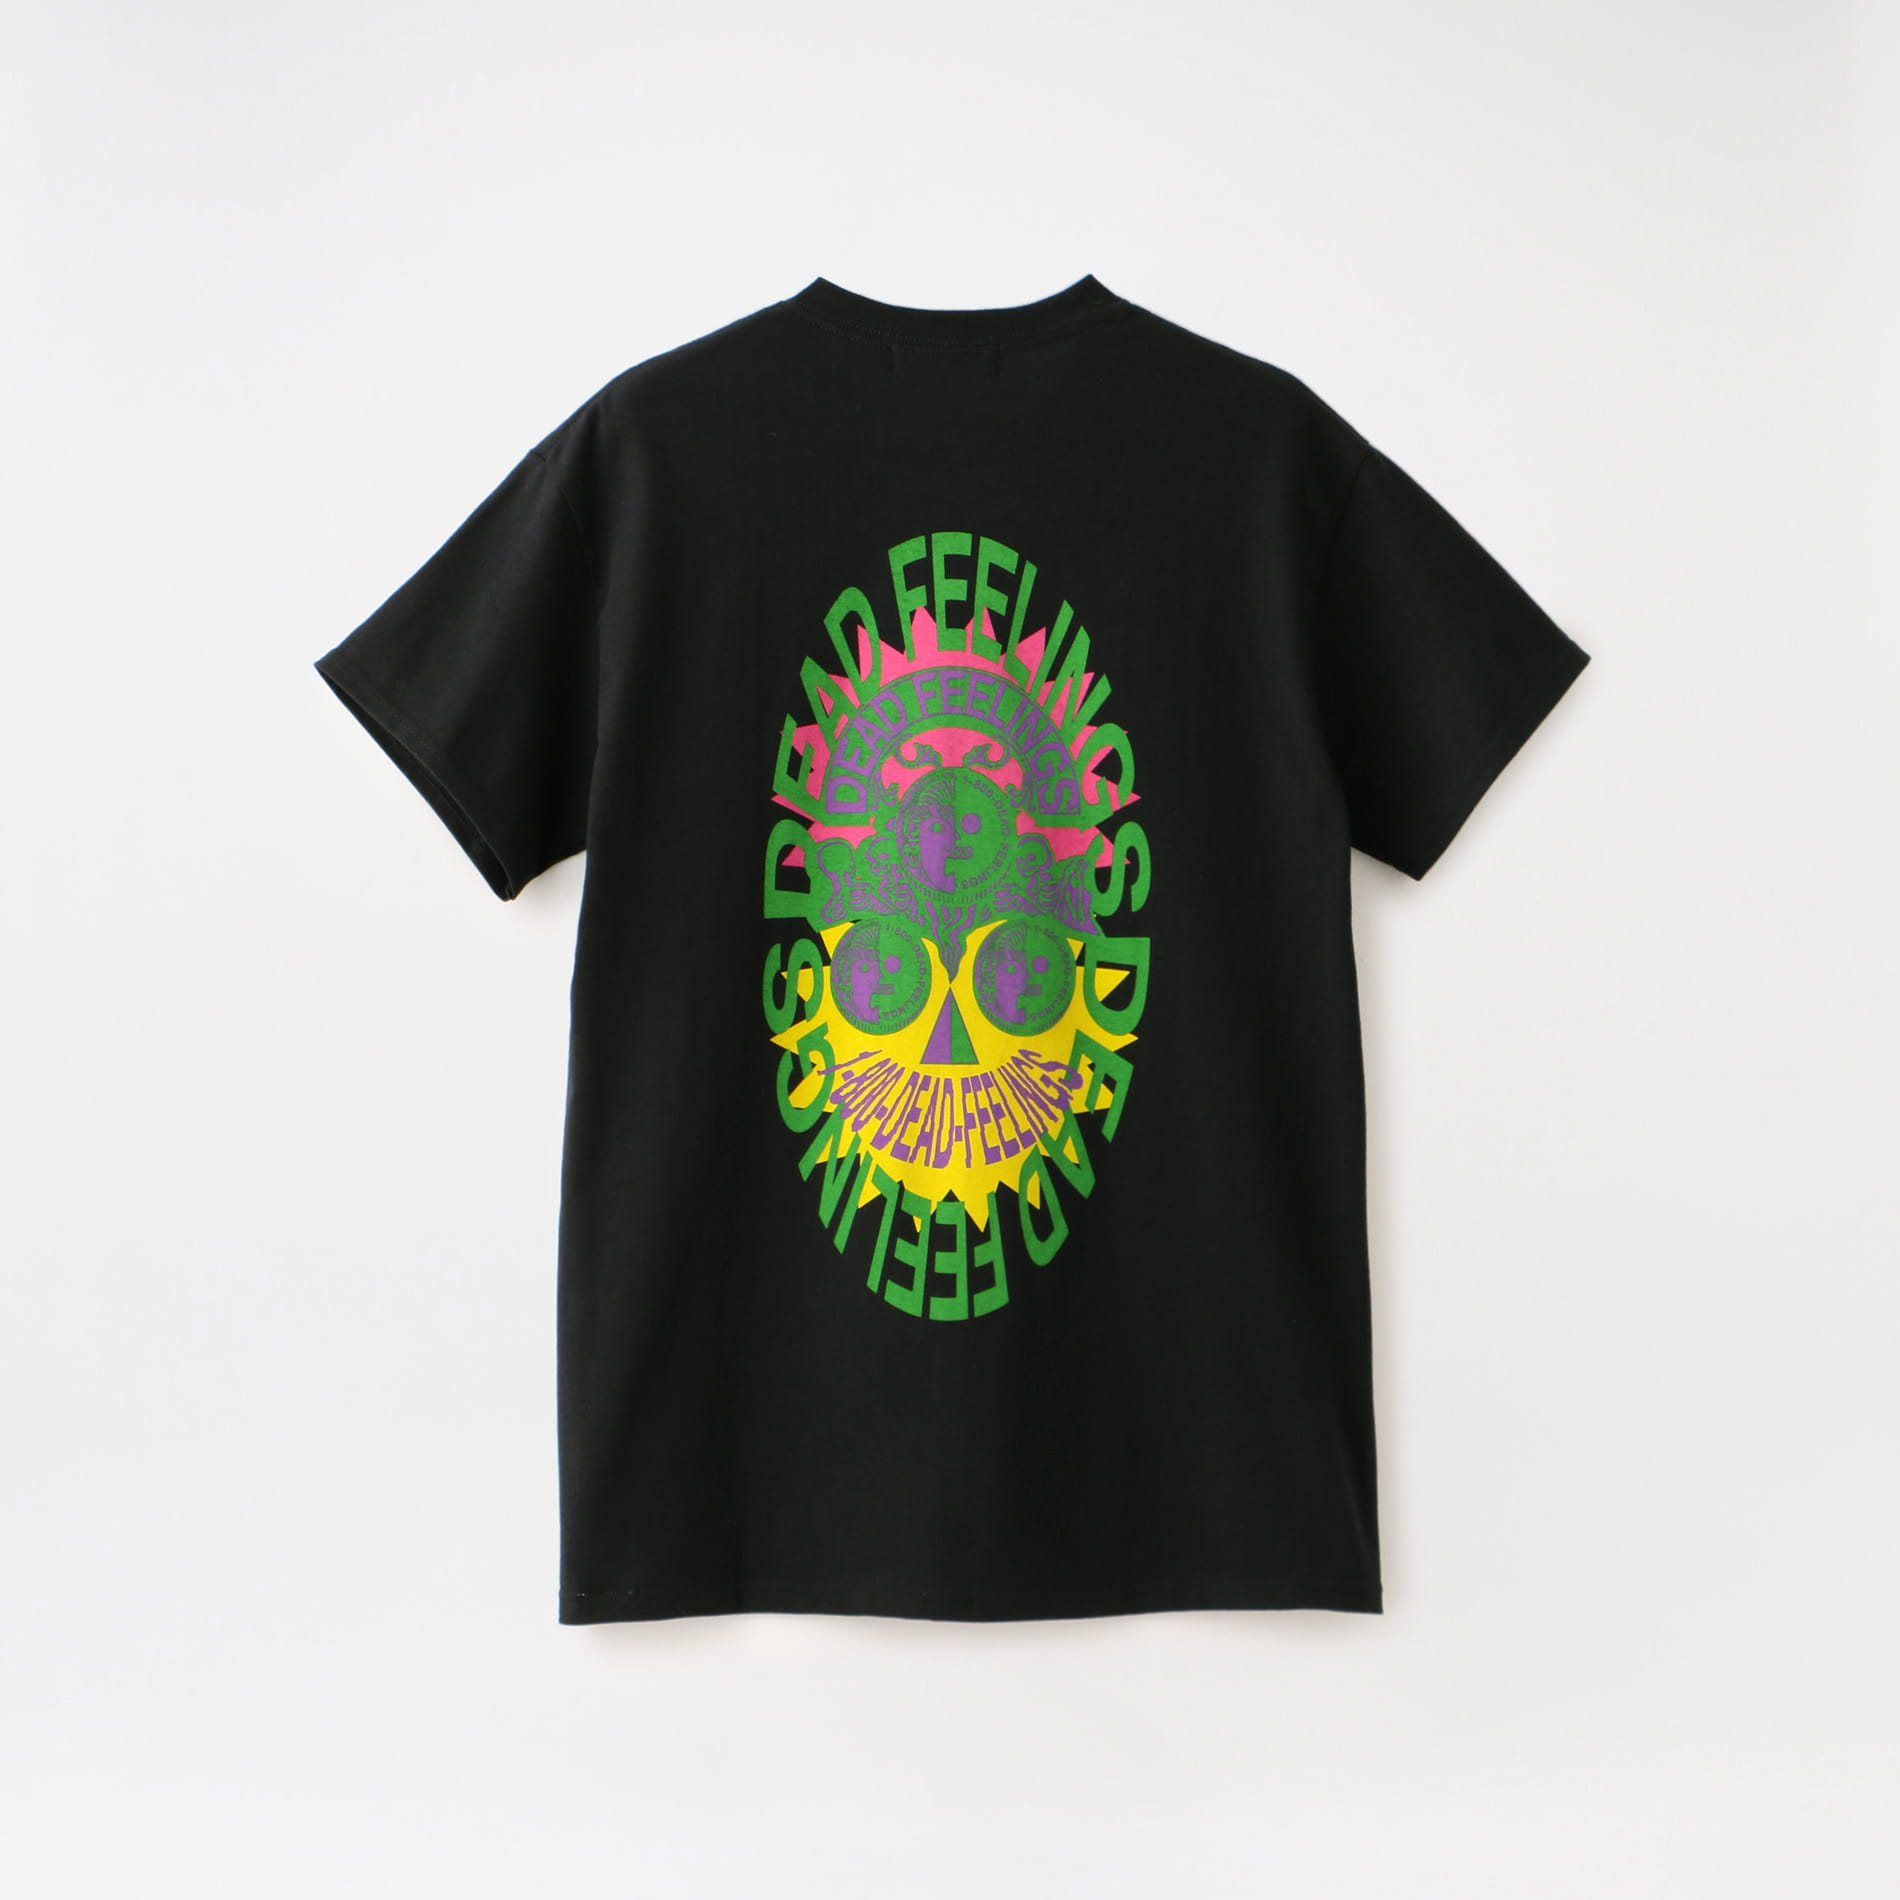 【DEAD FEELINGS】MEN S/S Pocket Tee - Mask GL631